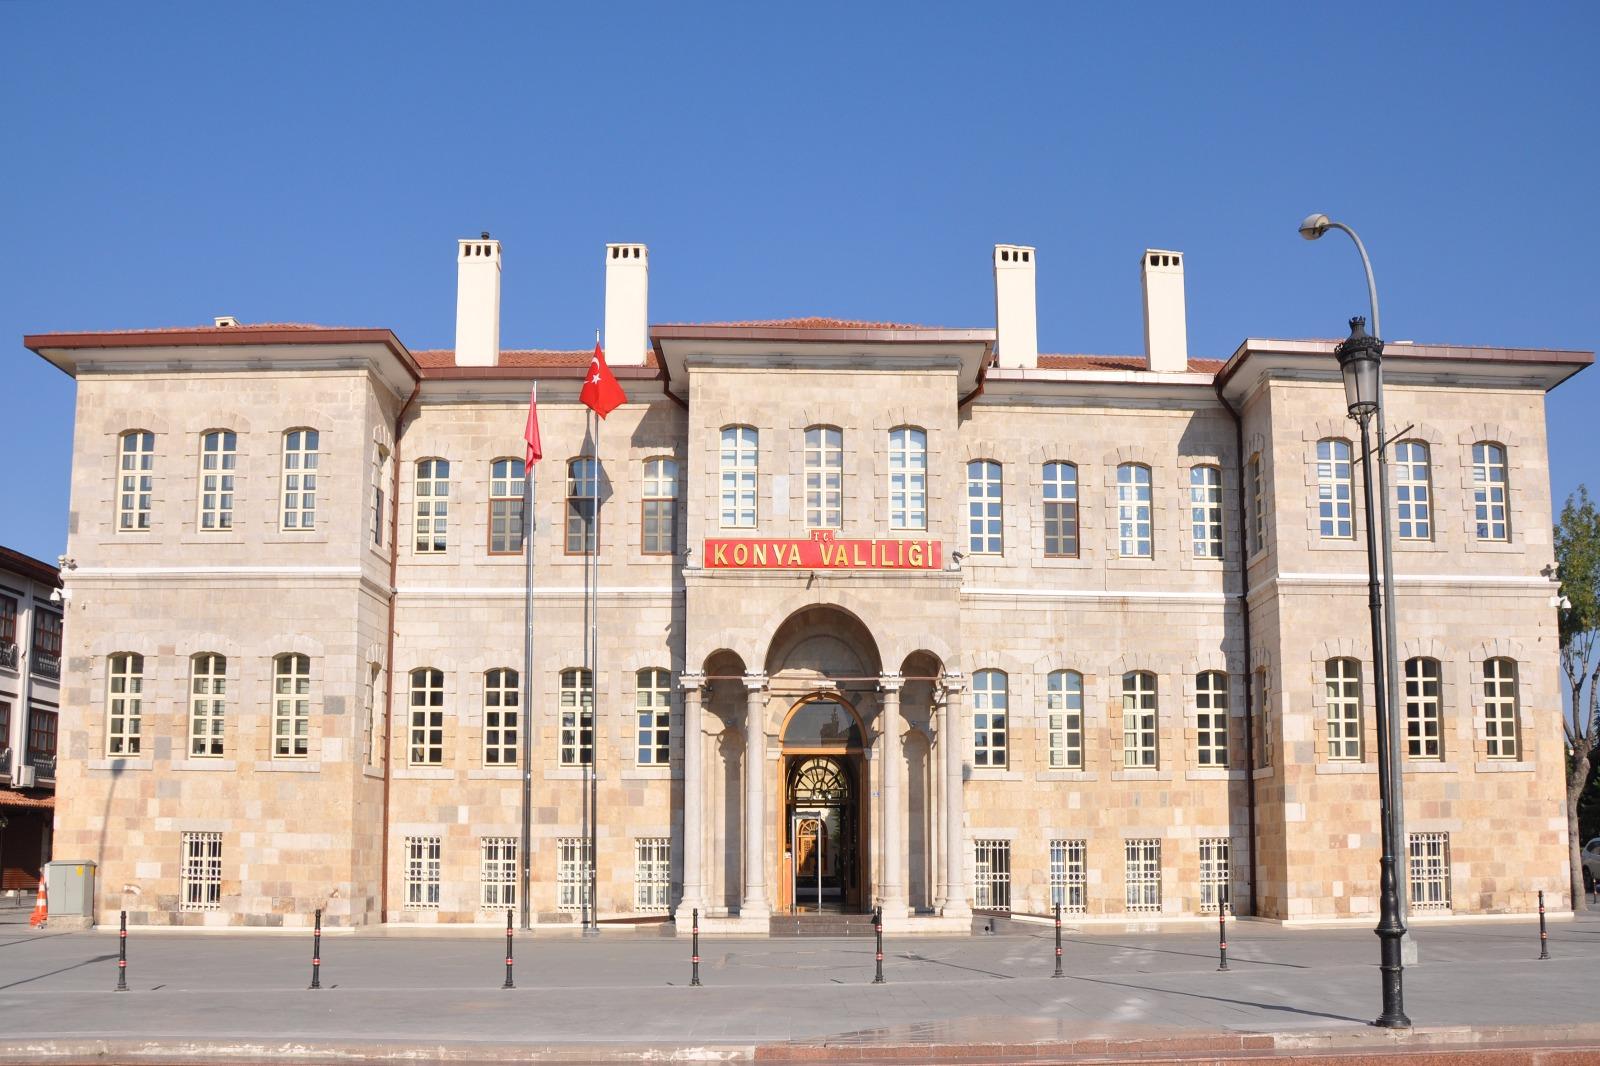 Konya'da FETÖ'den 2 bin 520 tutuklu var